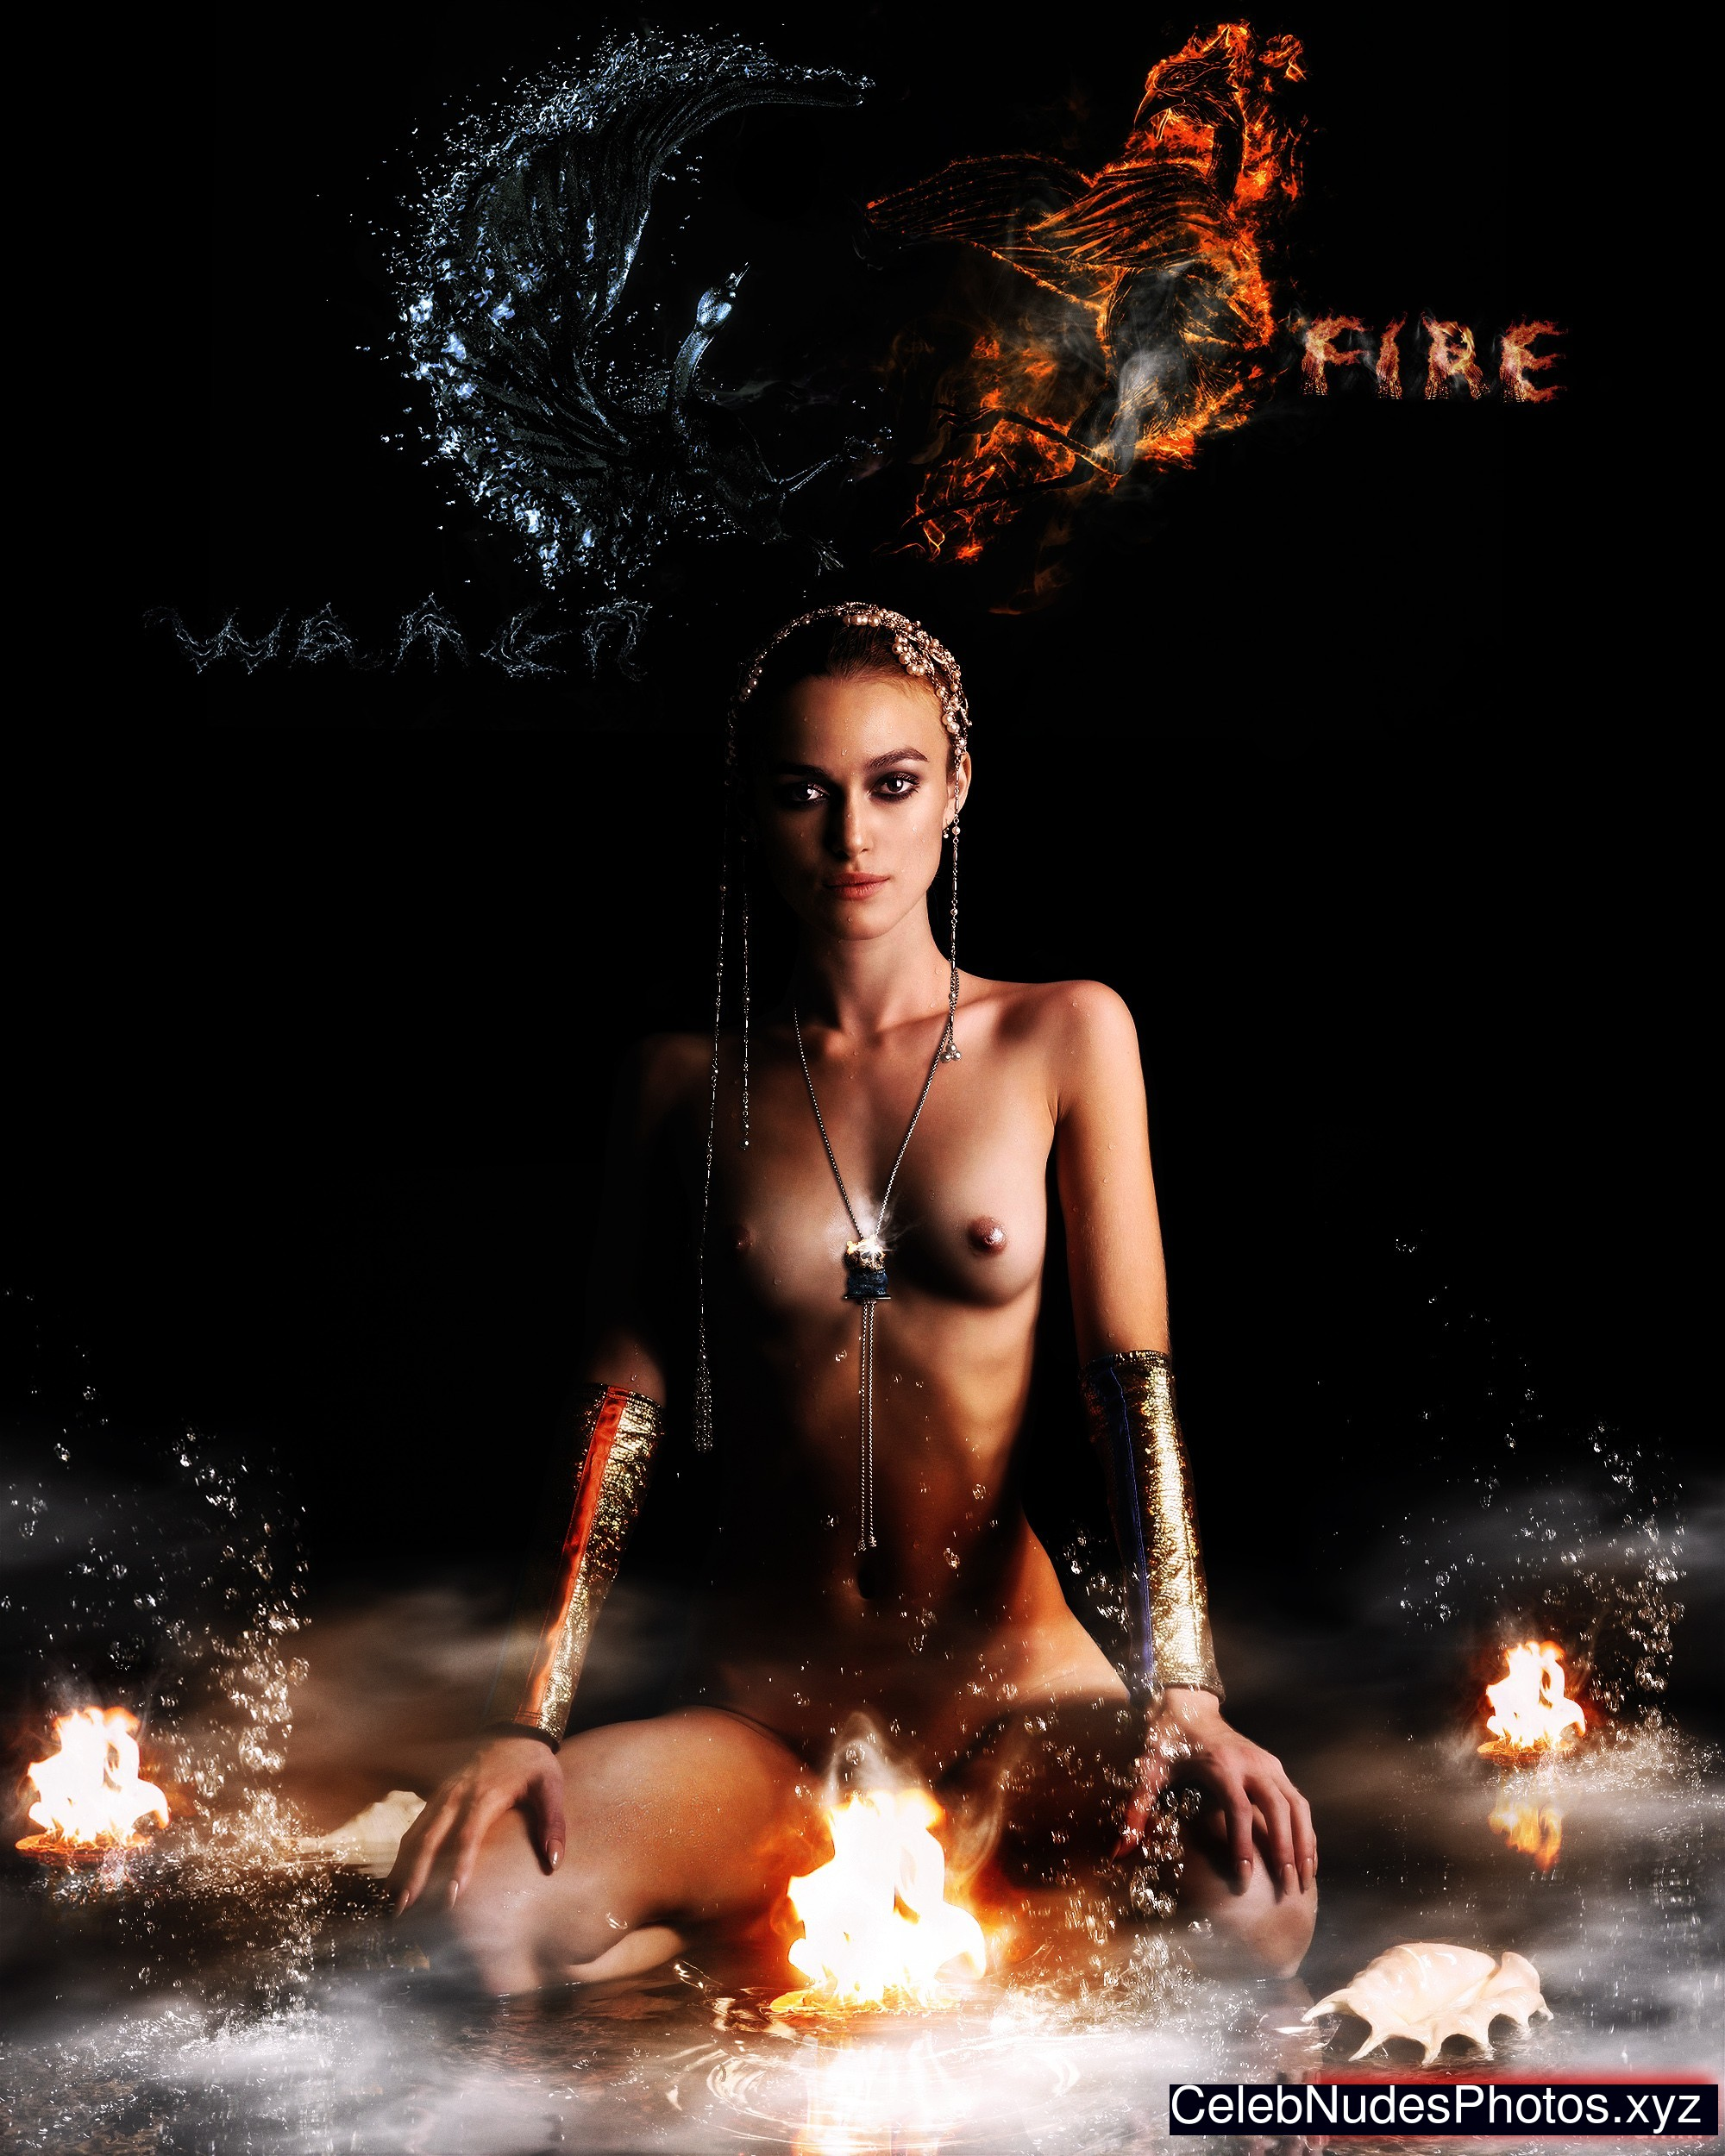 Keira Knightley Free Nude Celeb sexy 21